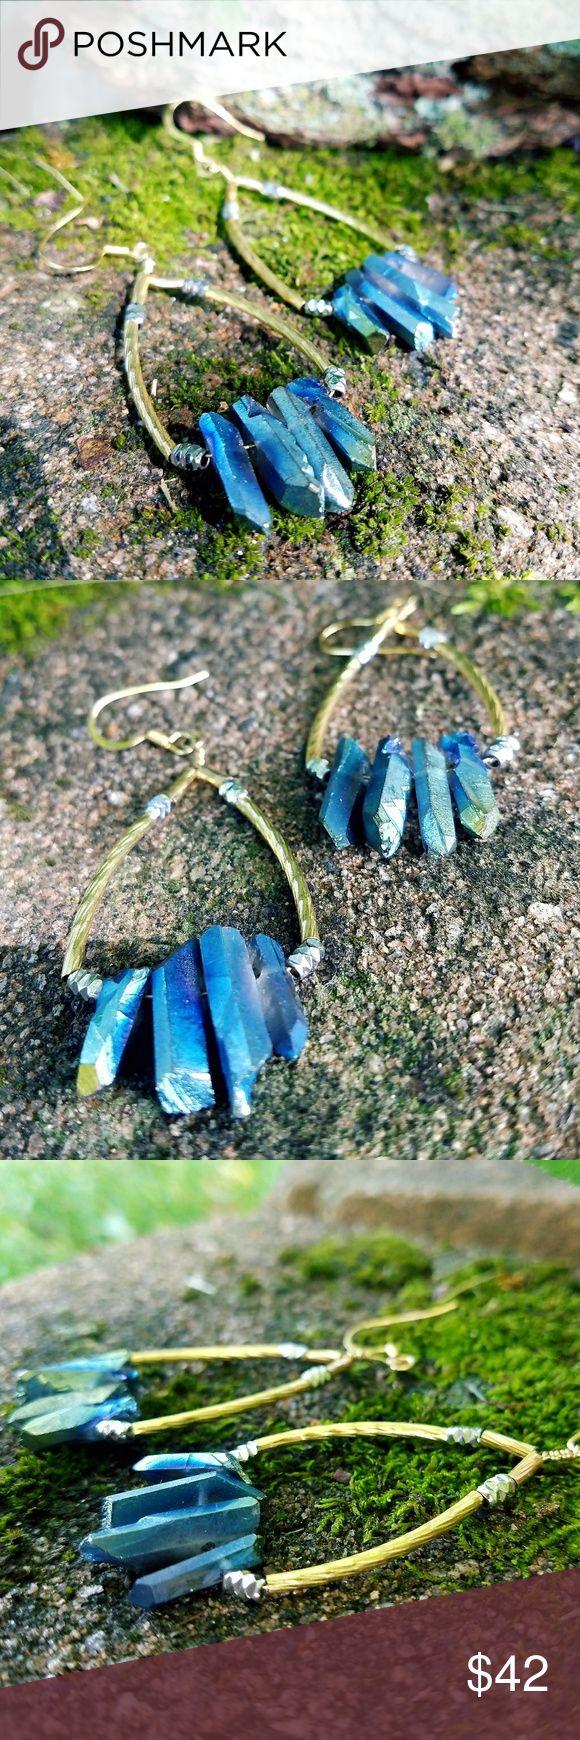 "Selling this ""Veritable Vivacity""⚡Titanium Crystal Earings on Poshmark! My username is: bearkatbandit. #shopmycloset #poshmark #fashion #shopping #style #forsale #Urban Outfitters #Jewelry"